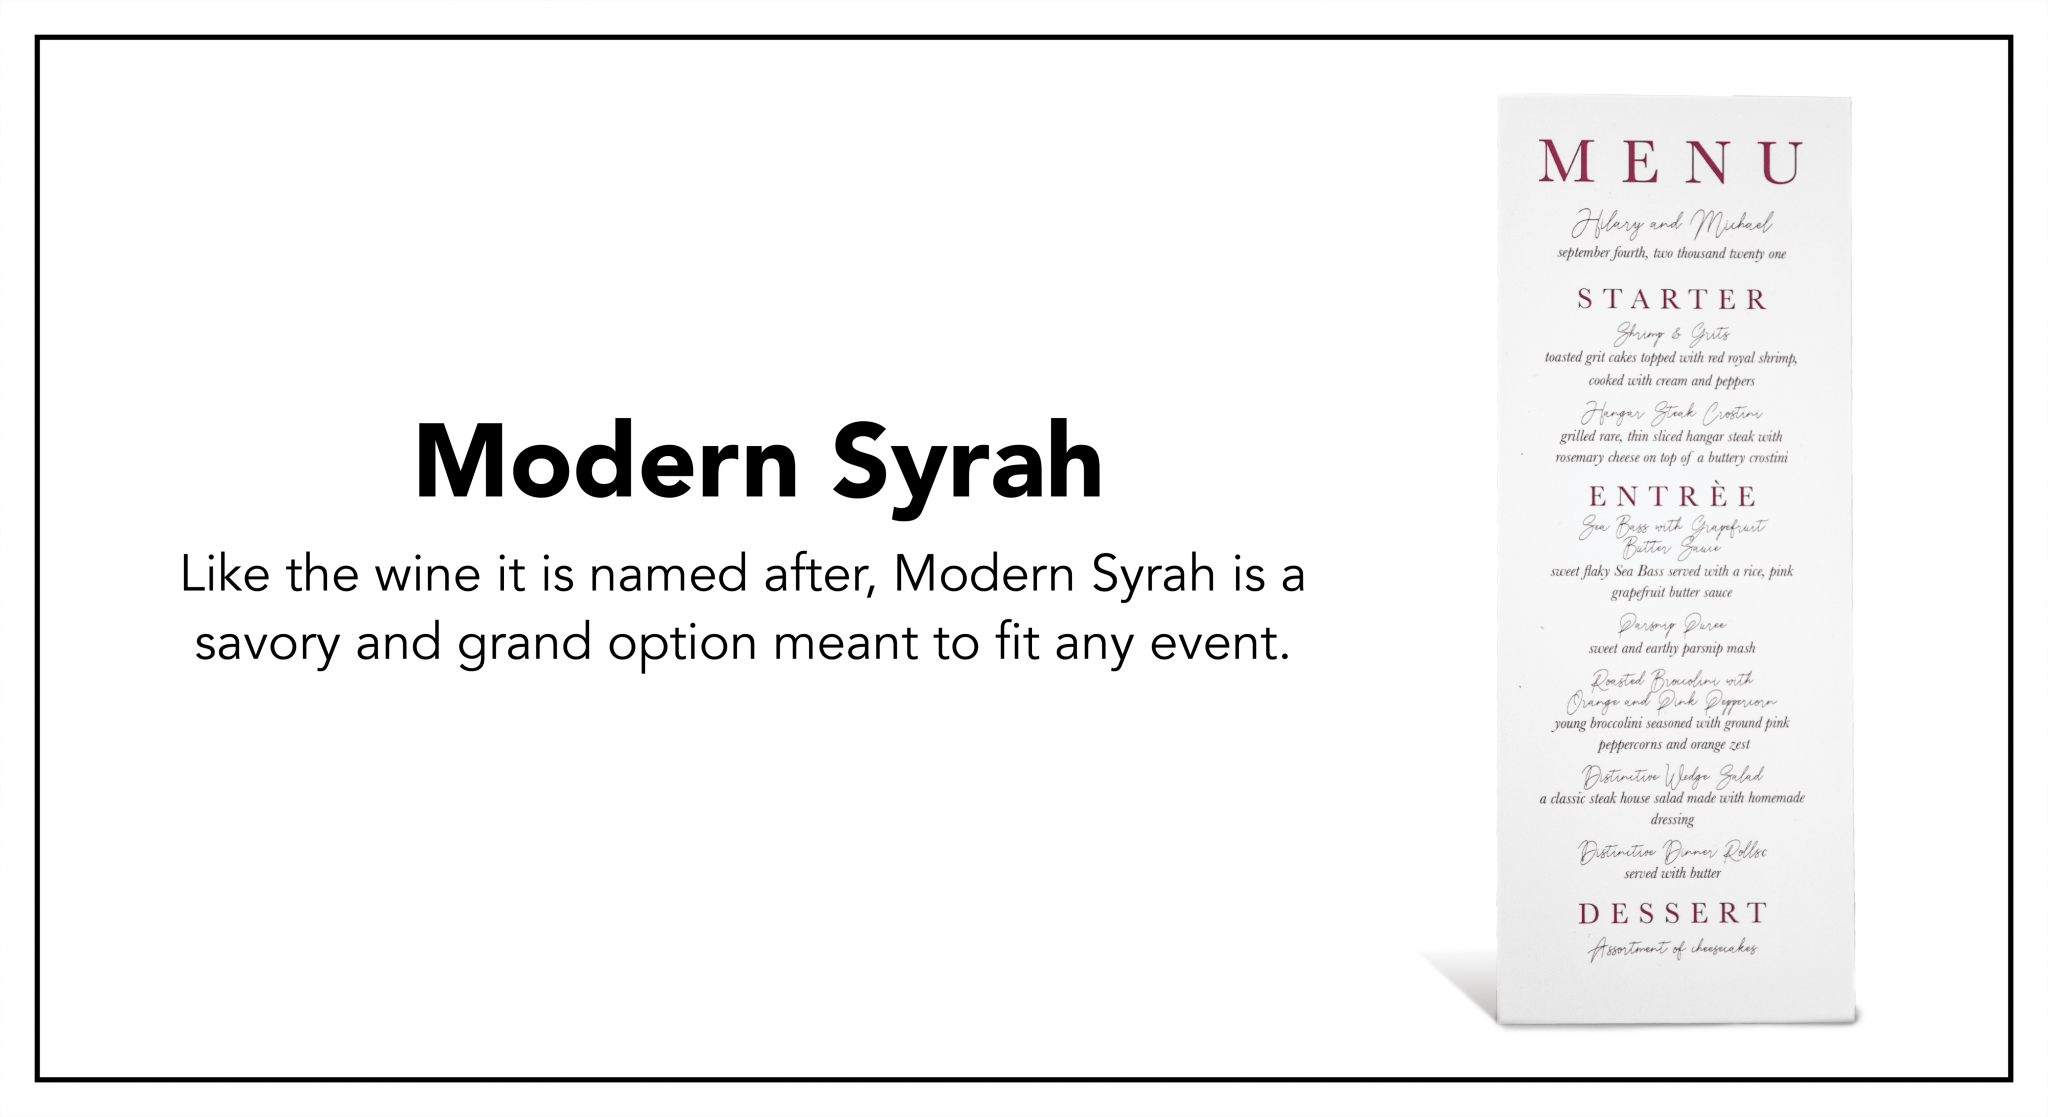 MODERN SYRAH